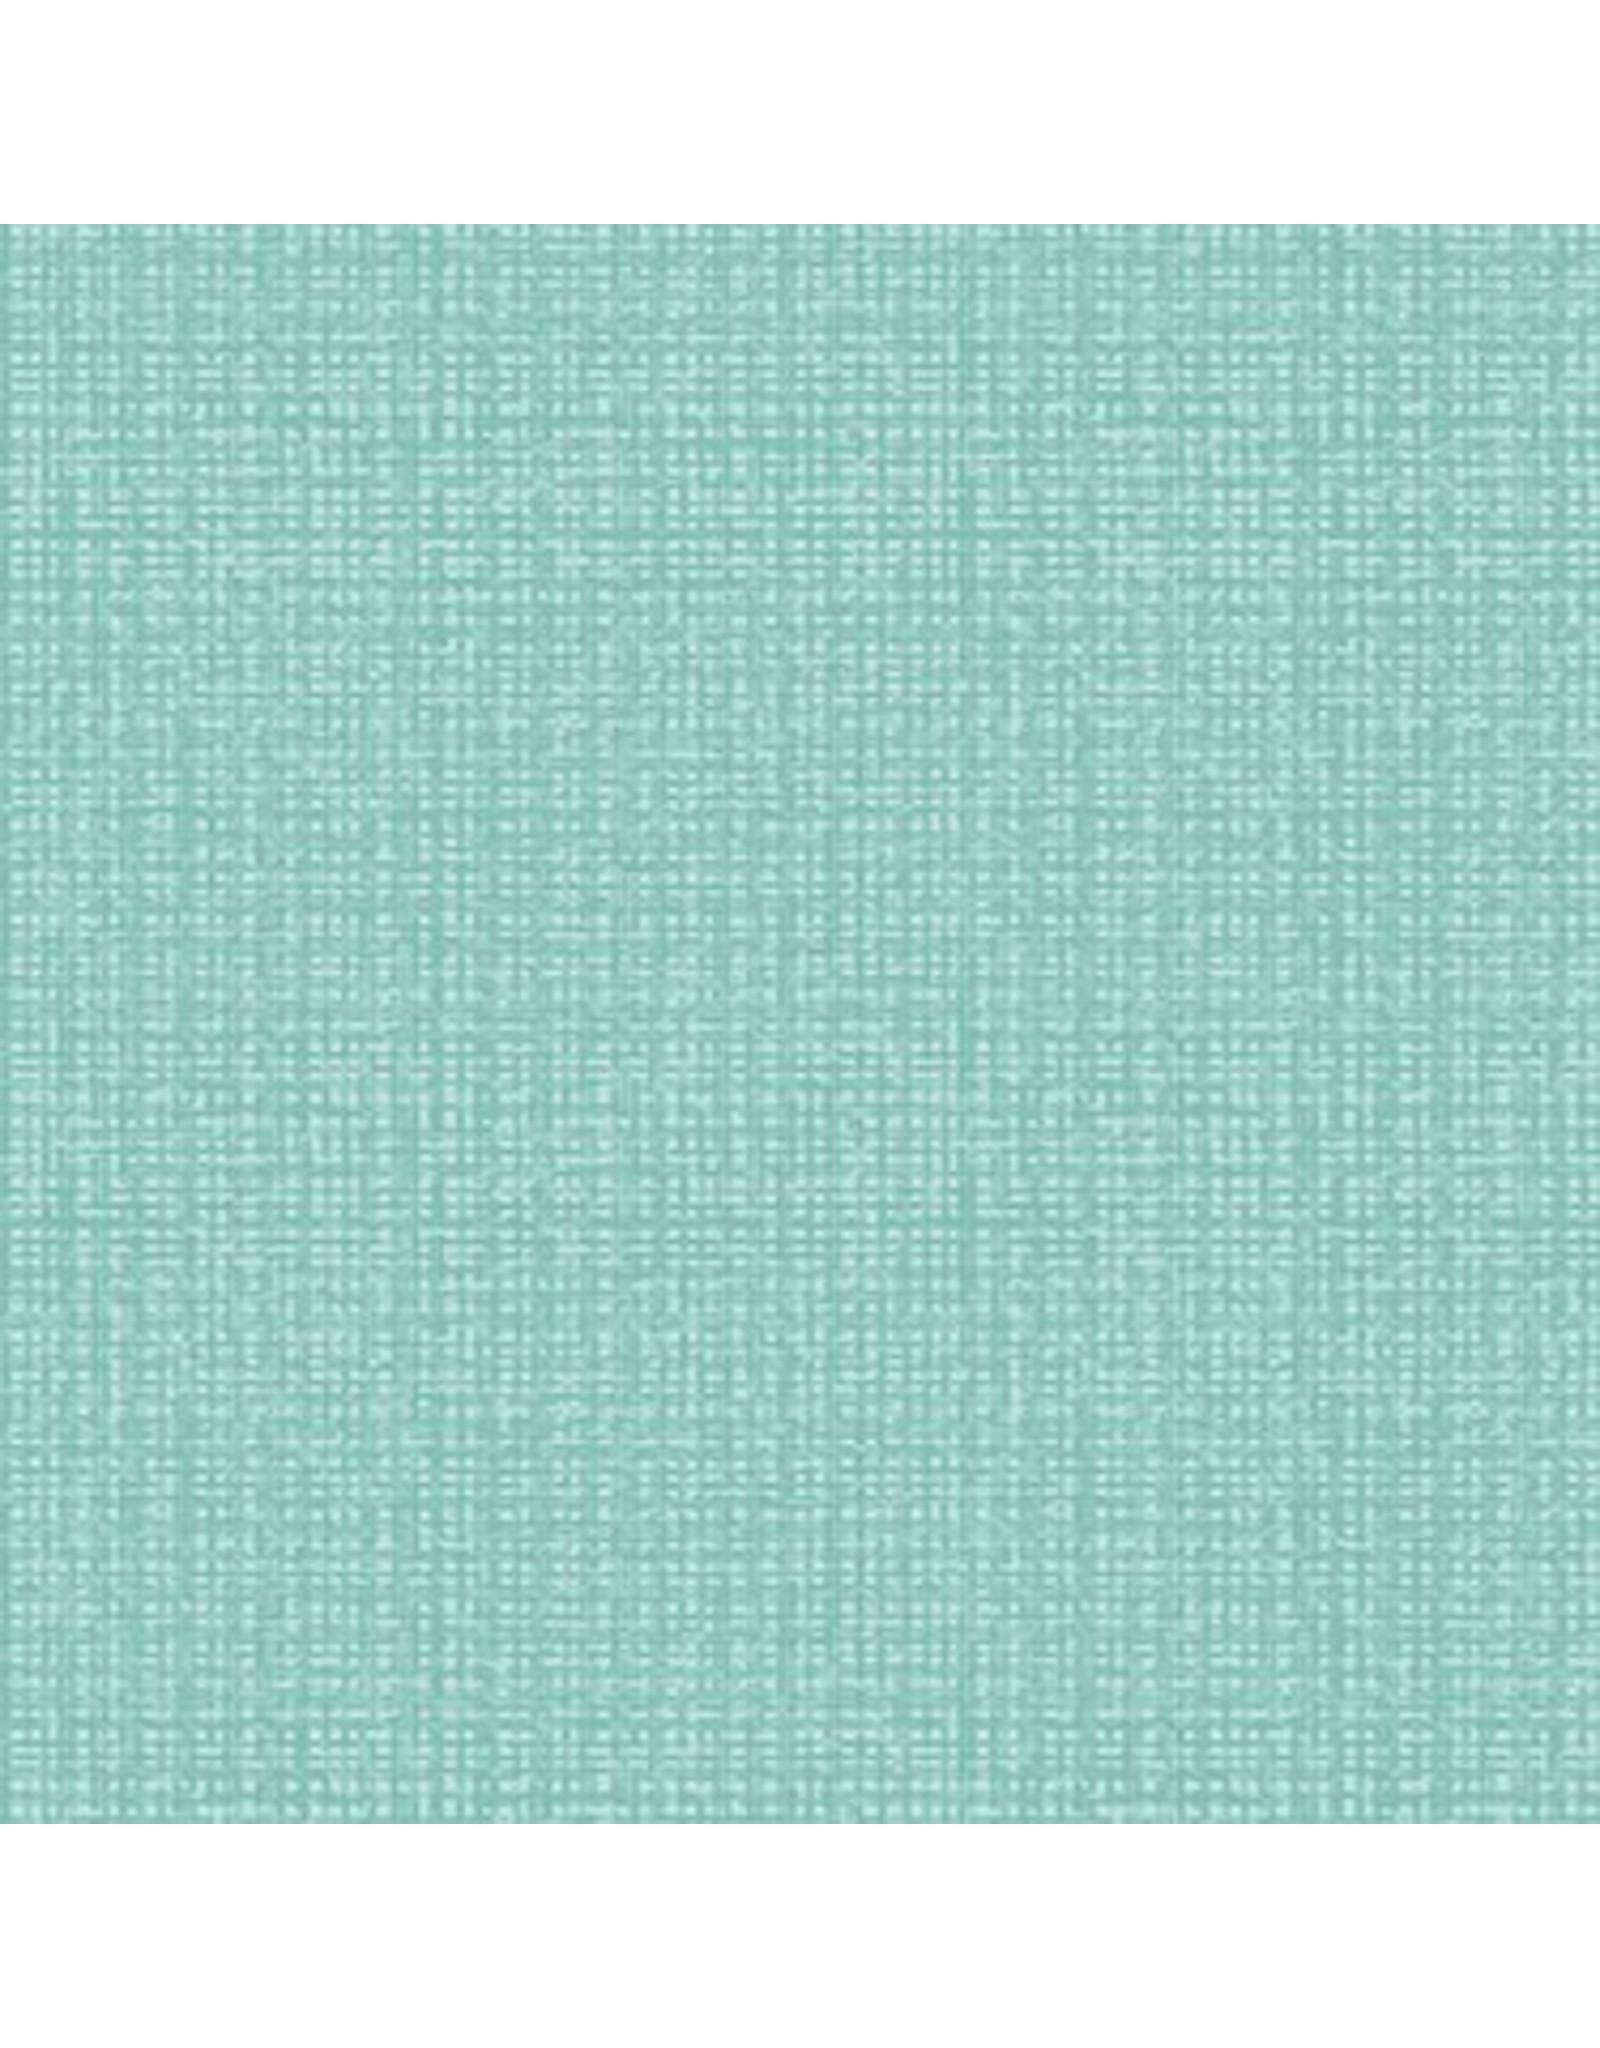 Contempo Color Weave - Medium Turquoise